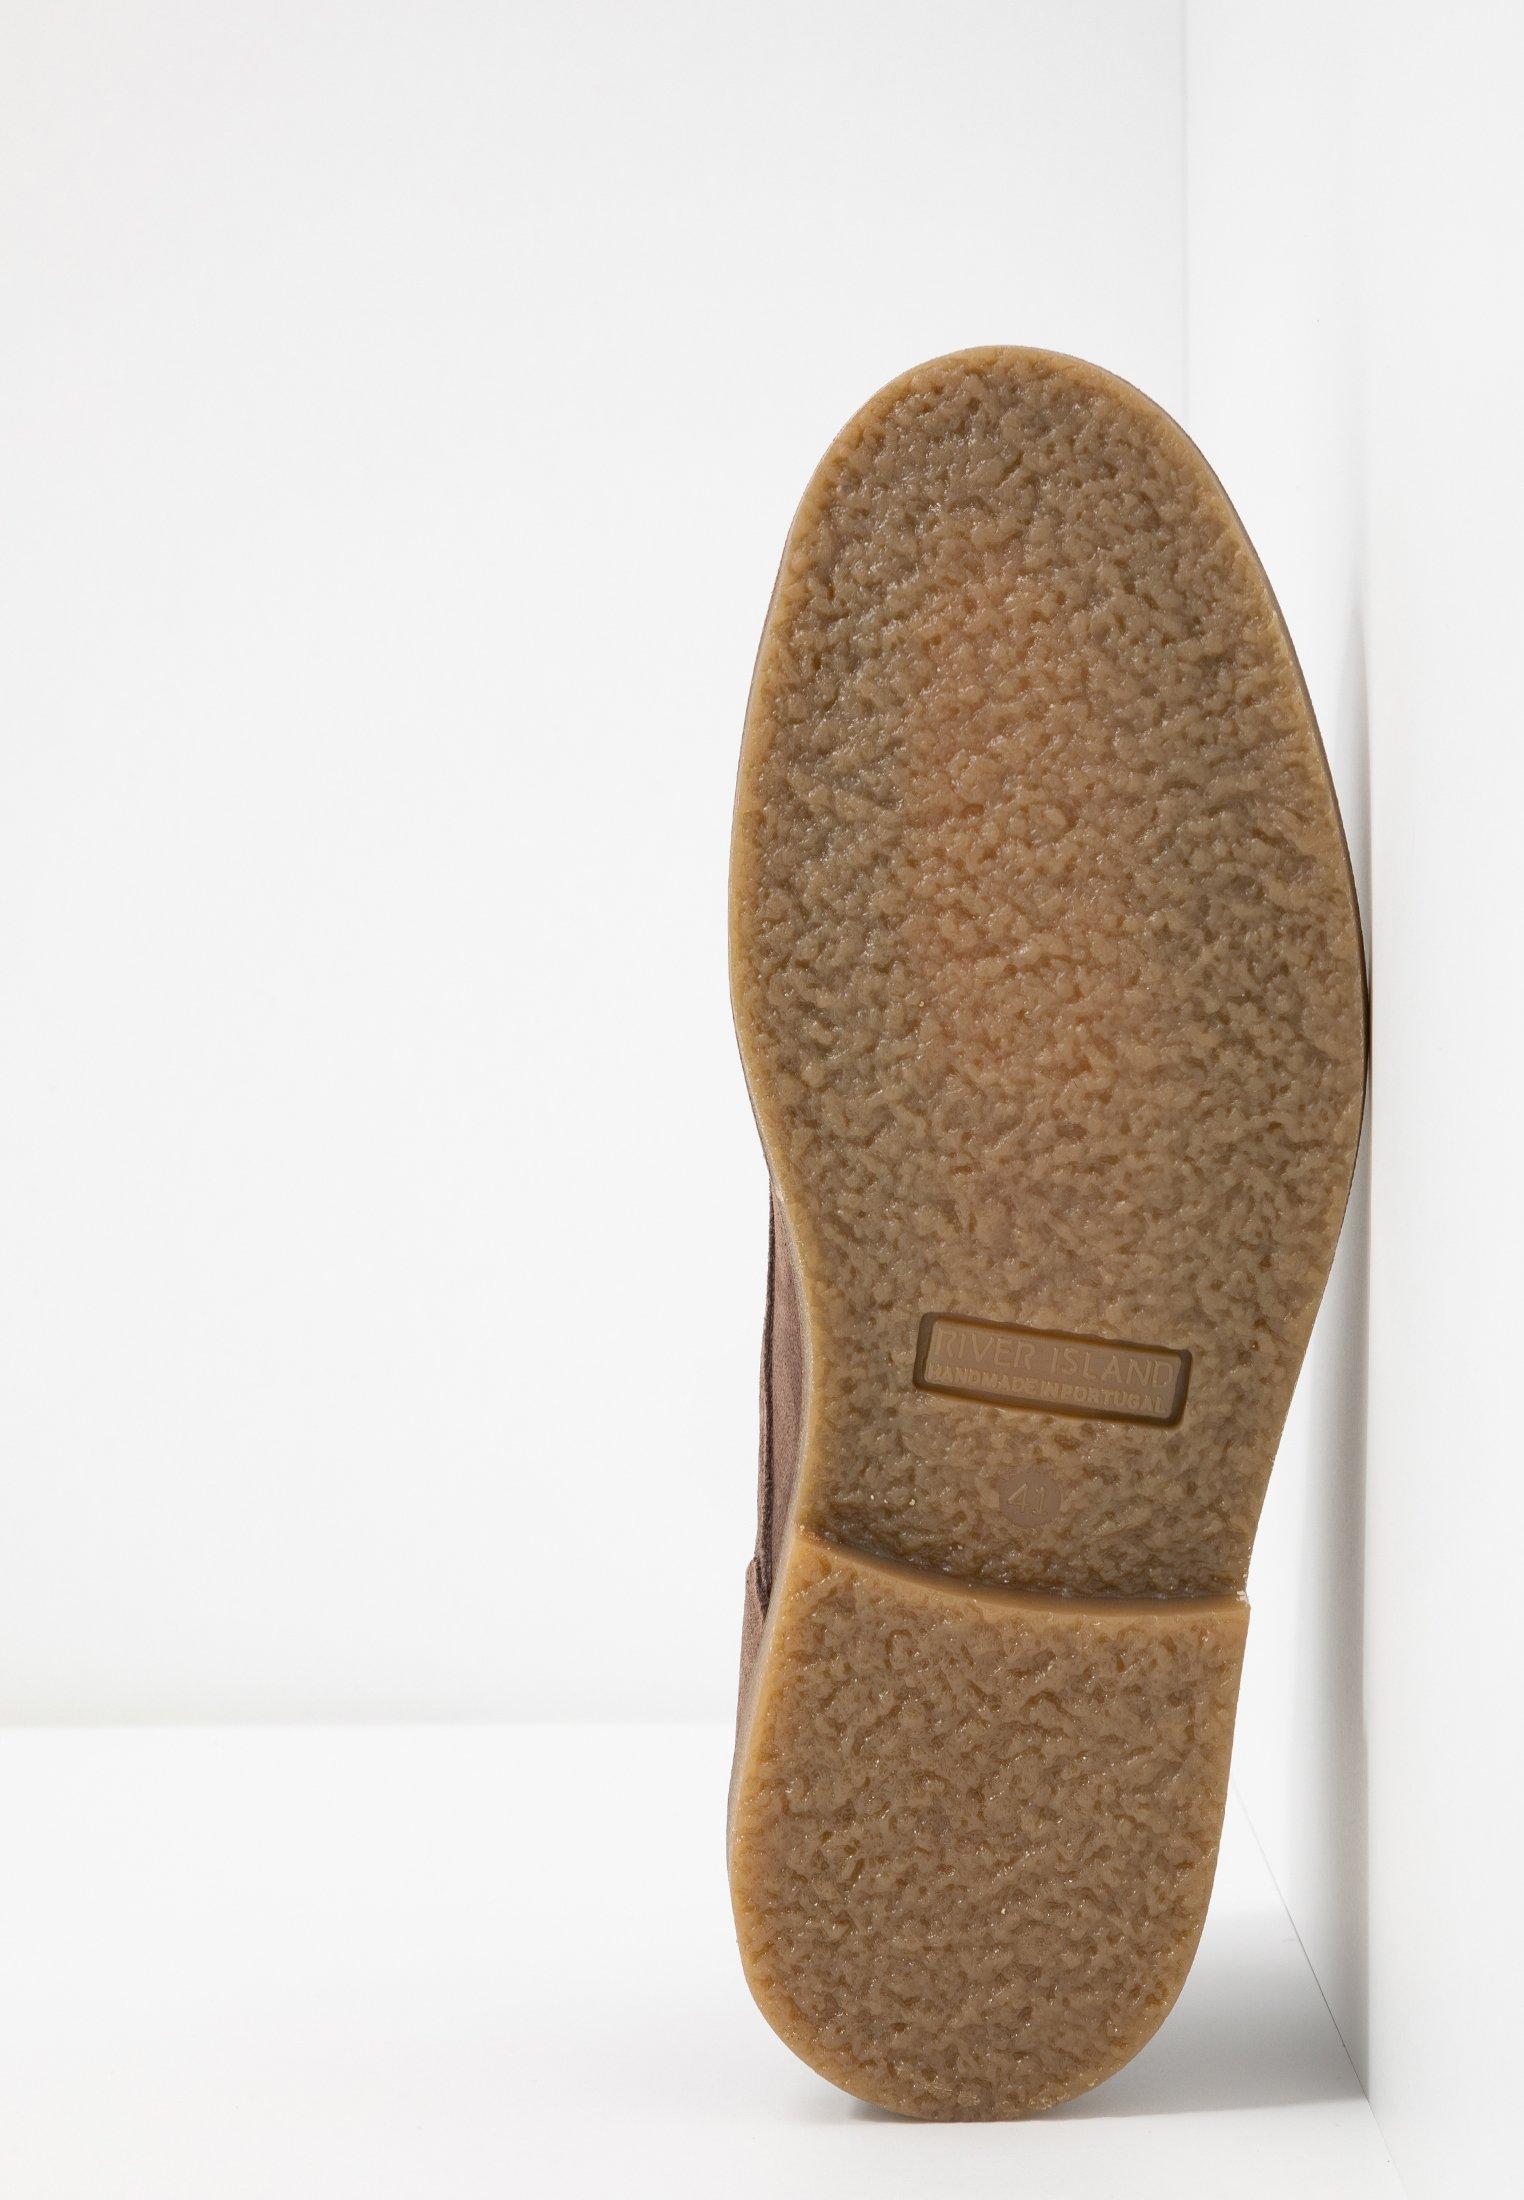 Island À Island River Chaussures LacetsStone Chaussures River rhQstd